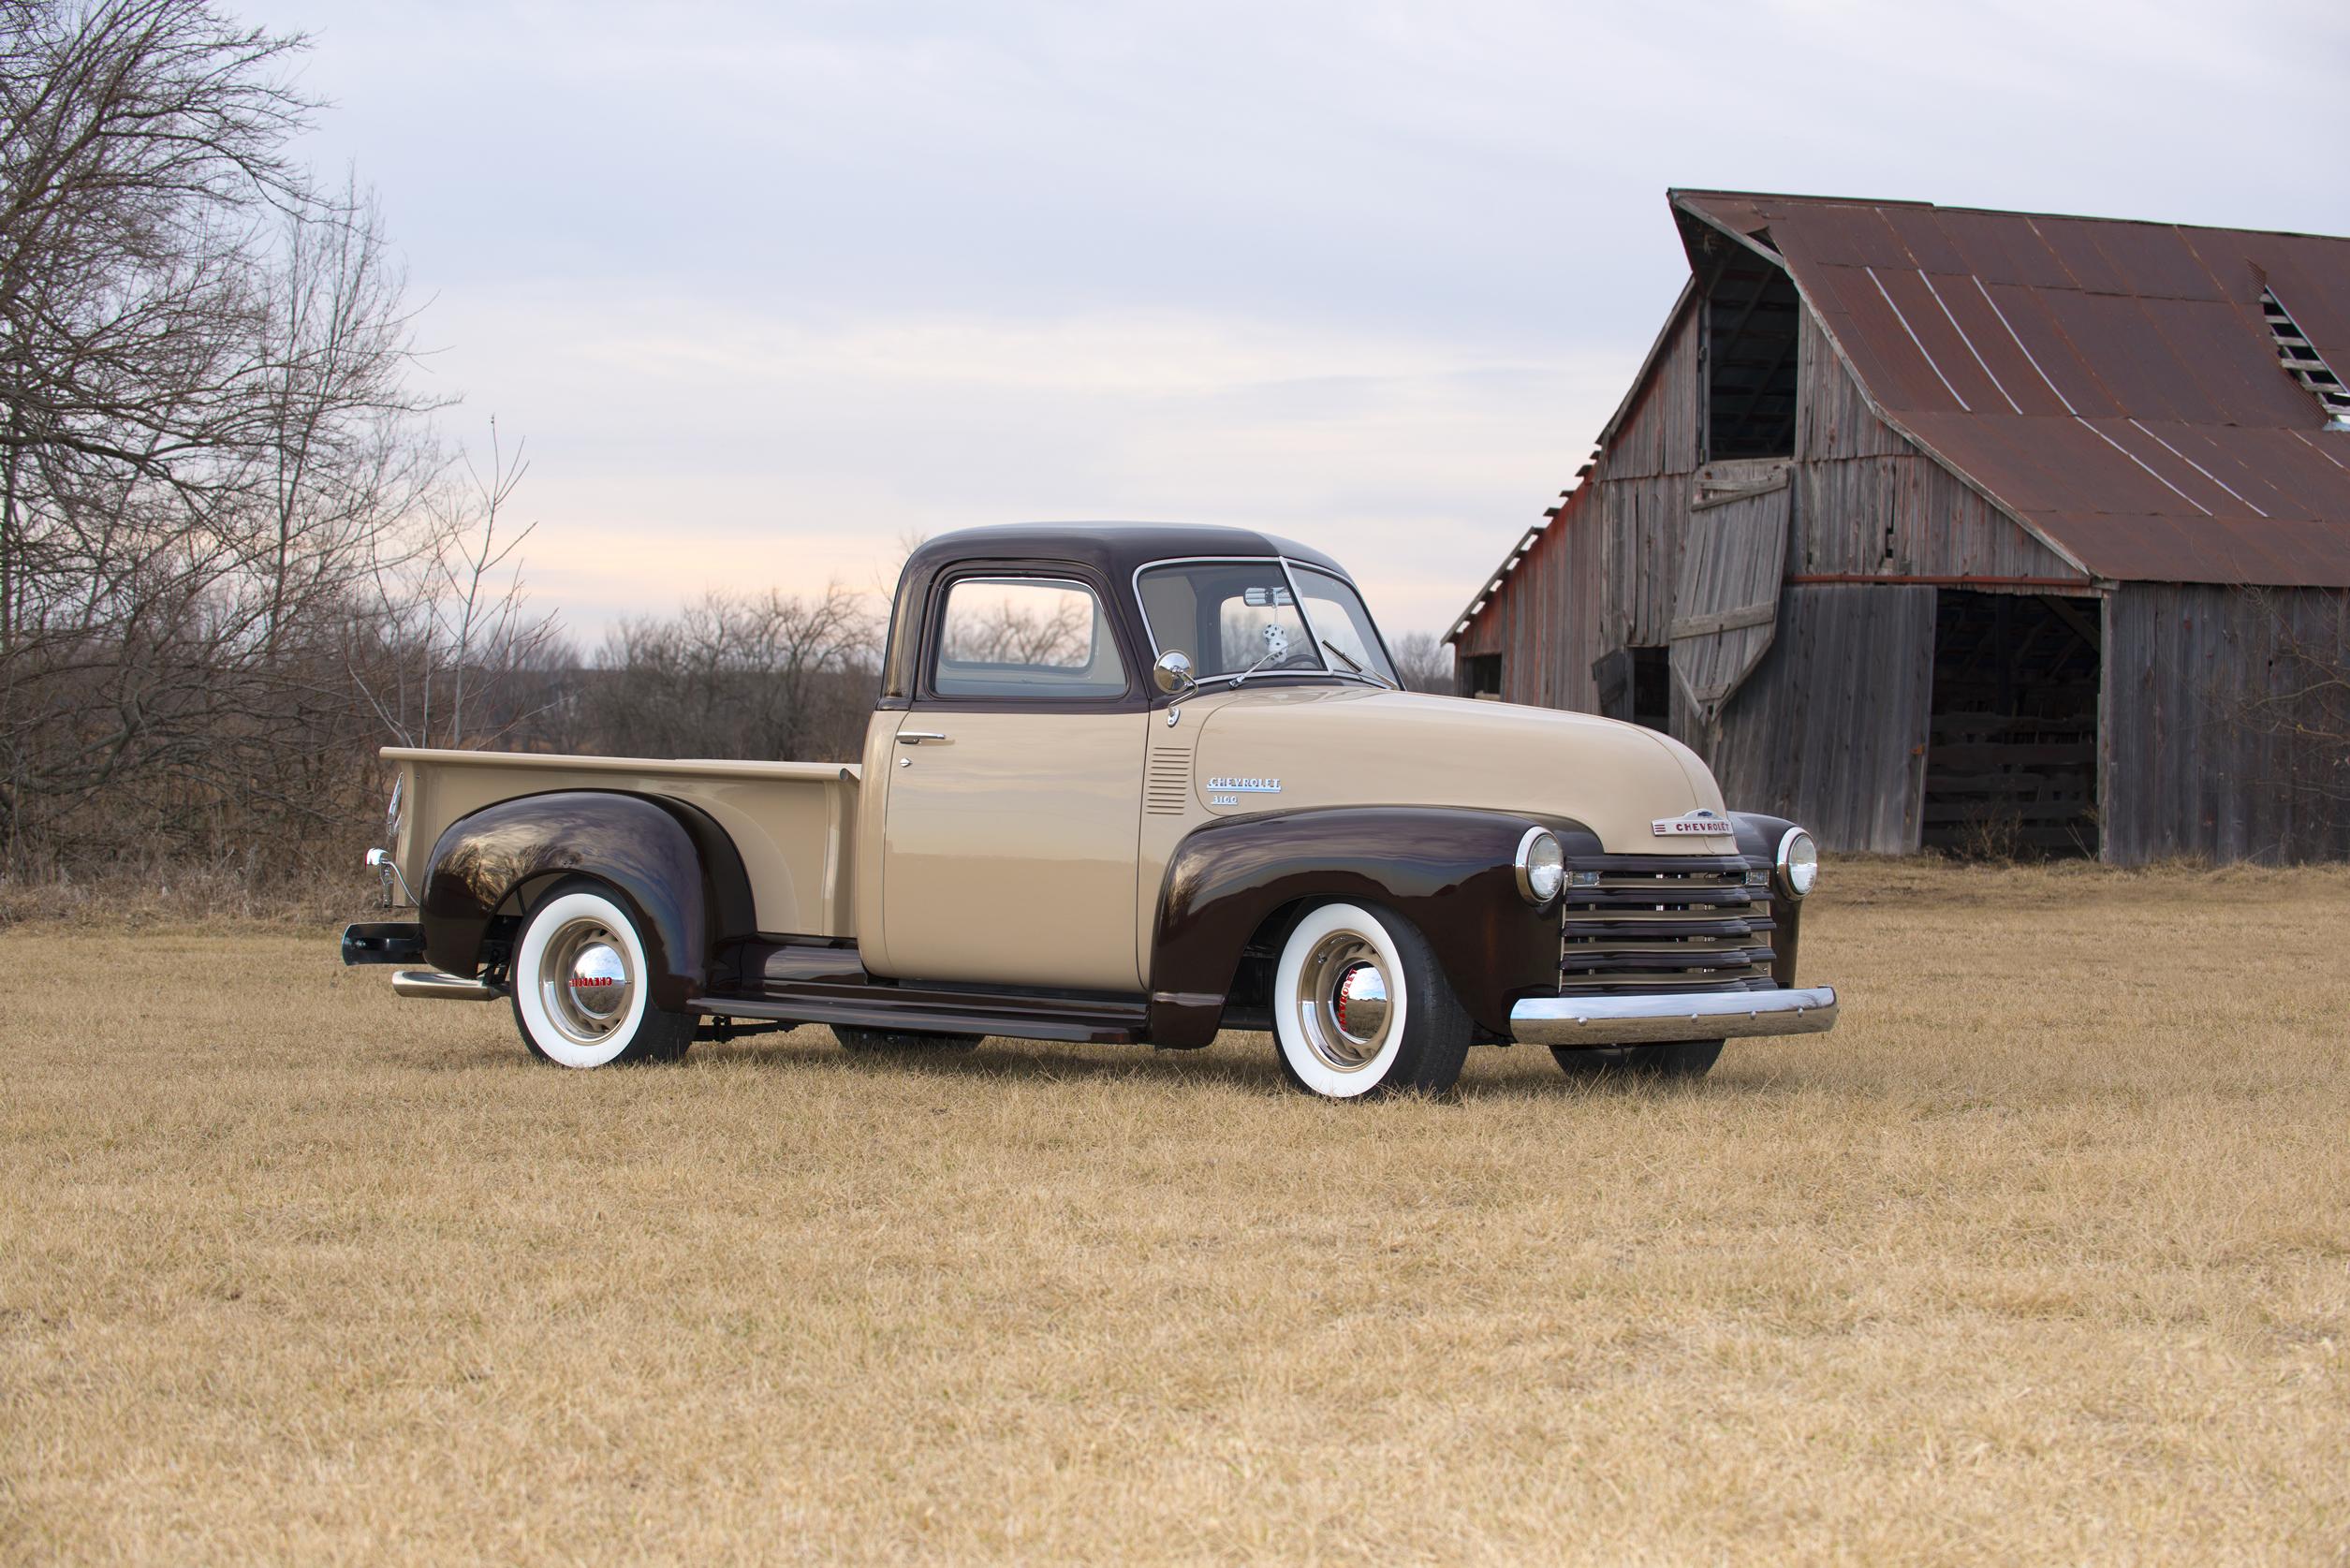 1948 Chevy Truck - Kultured Customs